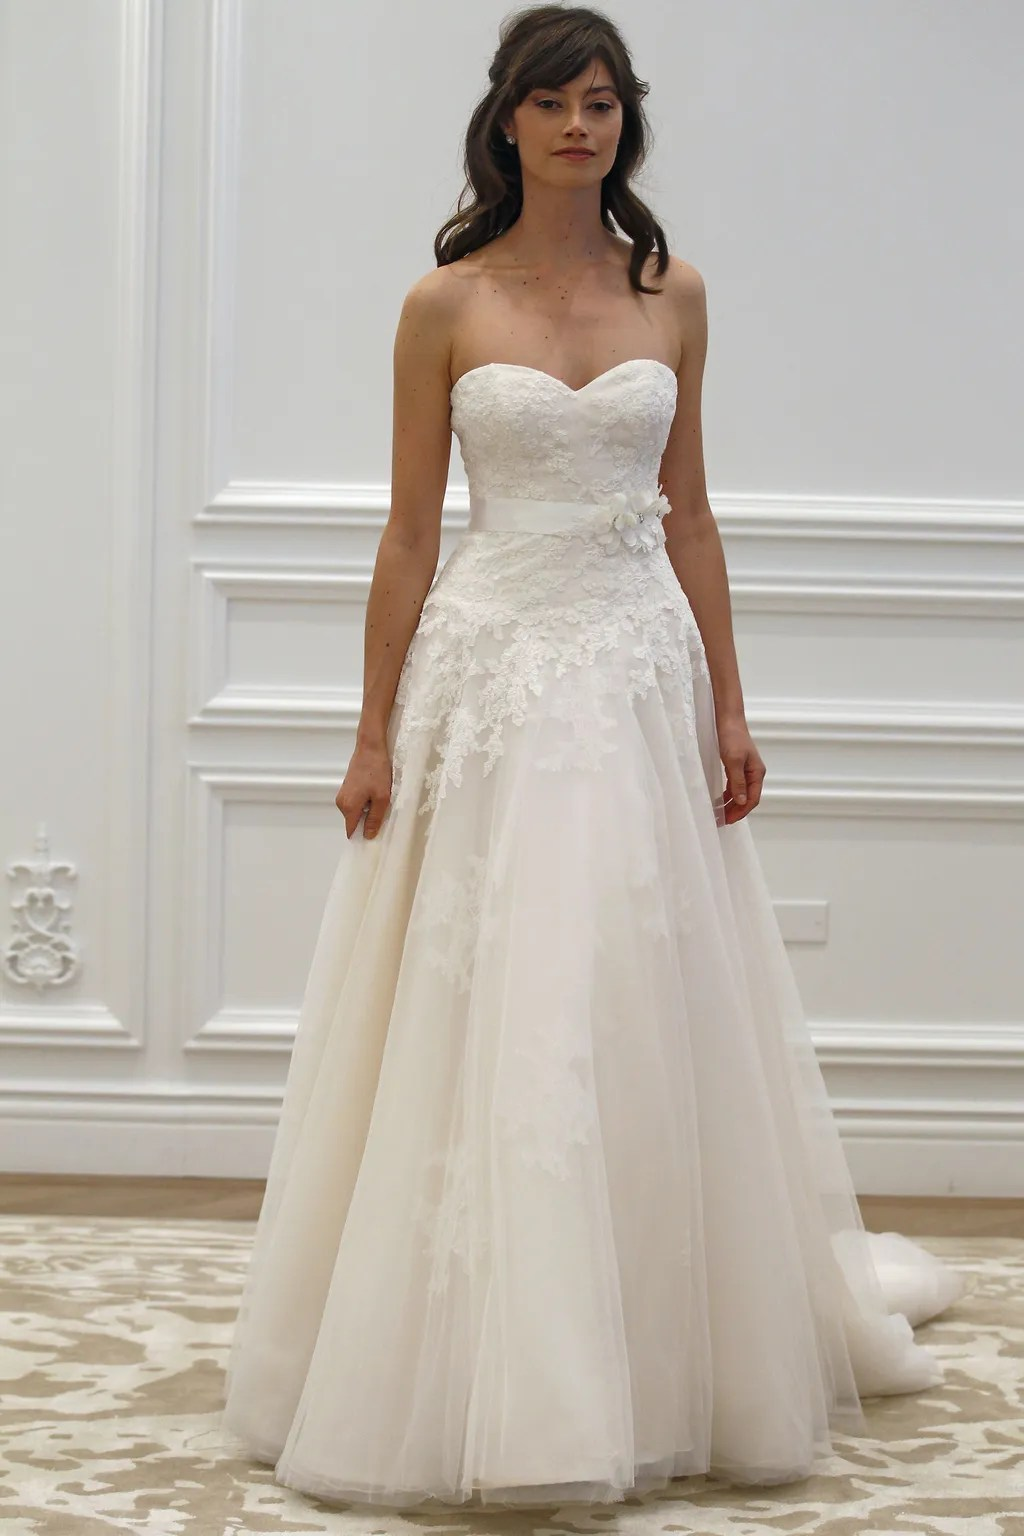 Strapless Wedding Dresses, Wedding Gowns Best New